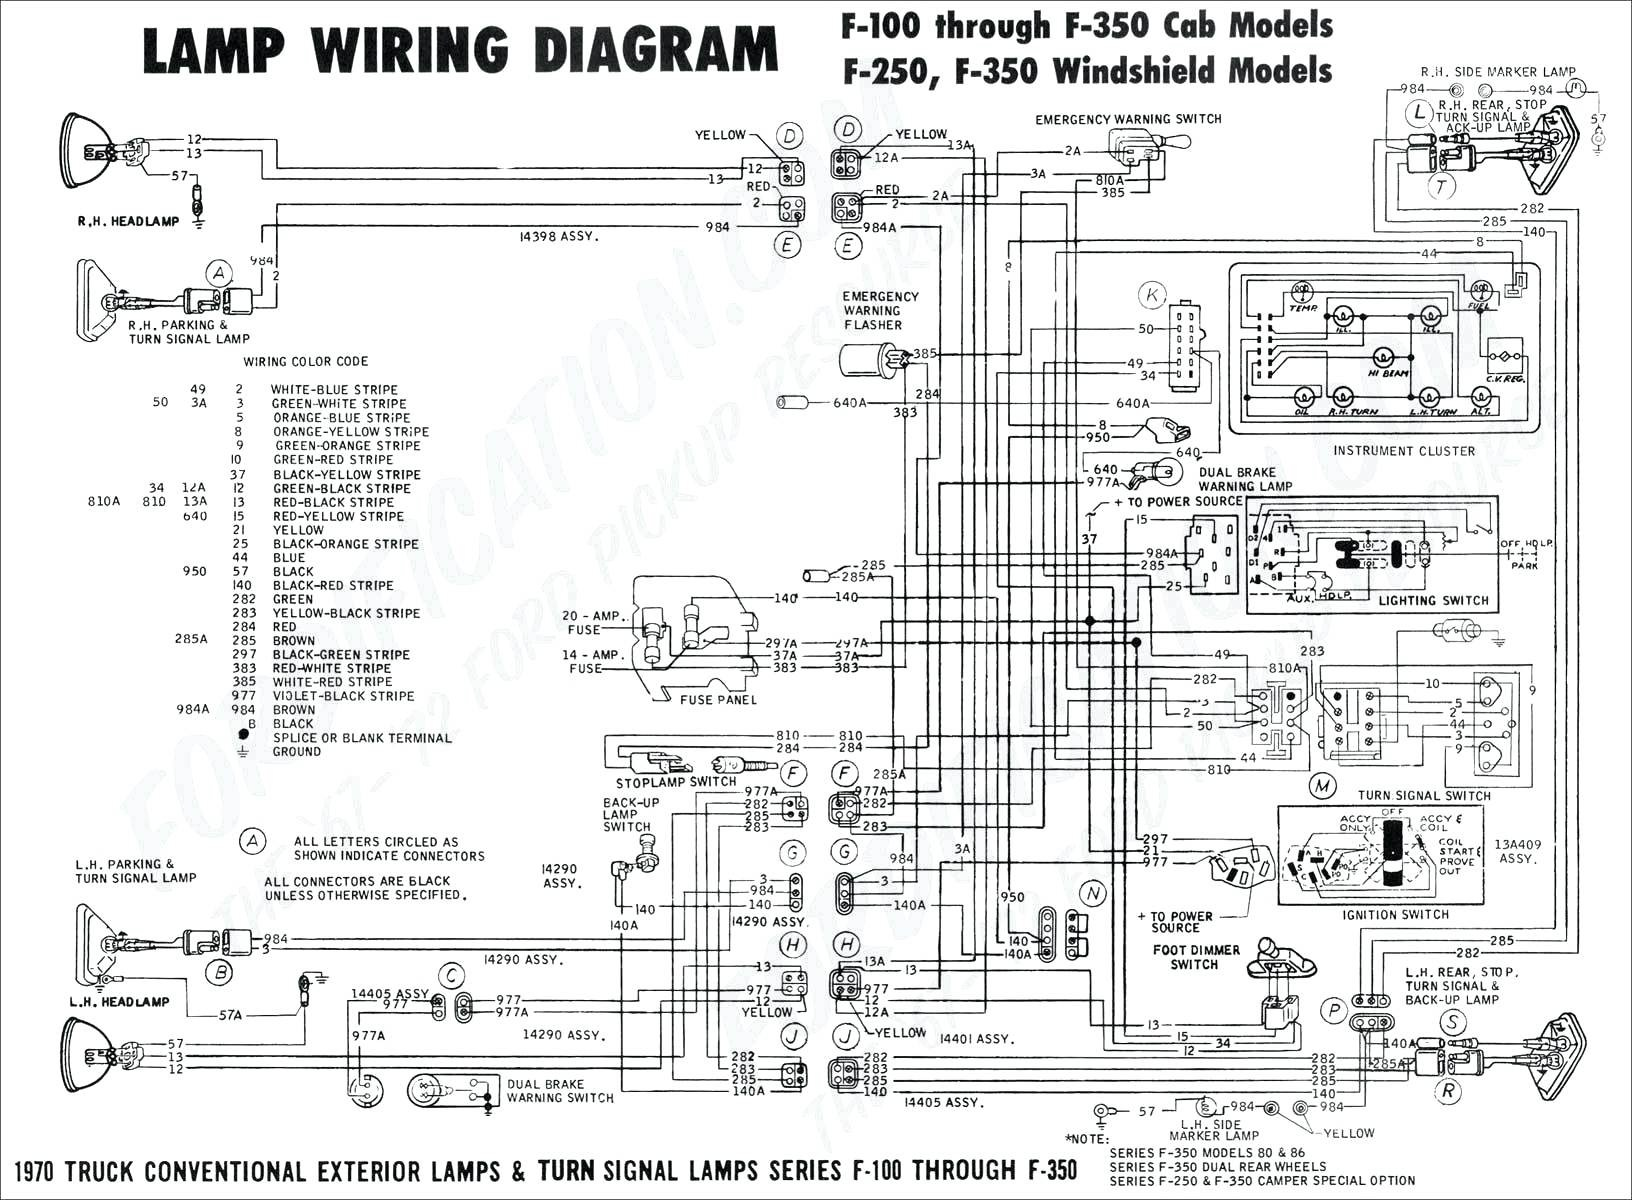 86 sierra wiring diagram 86 sierra wiring diagram wiring diagram data  86 sierra wiring diagram wiring